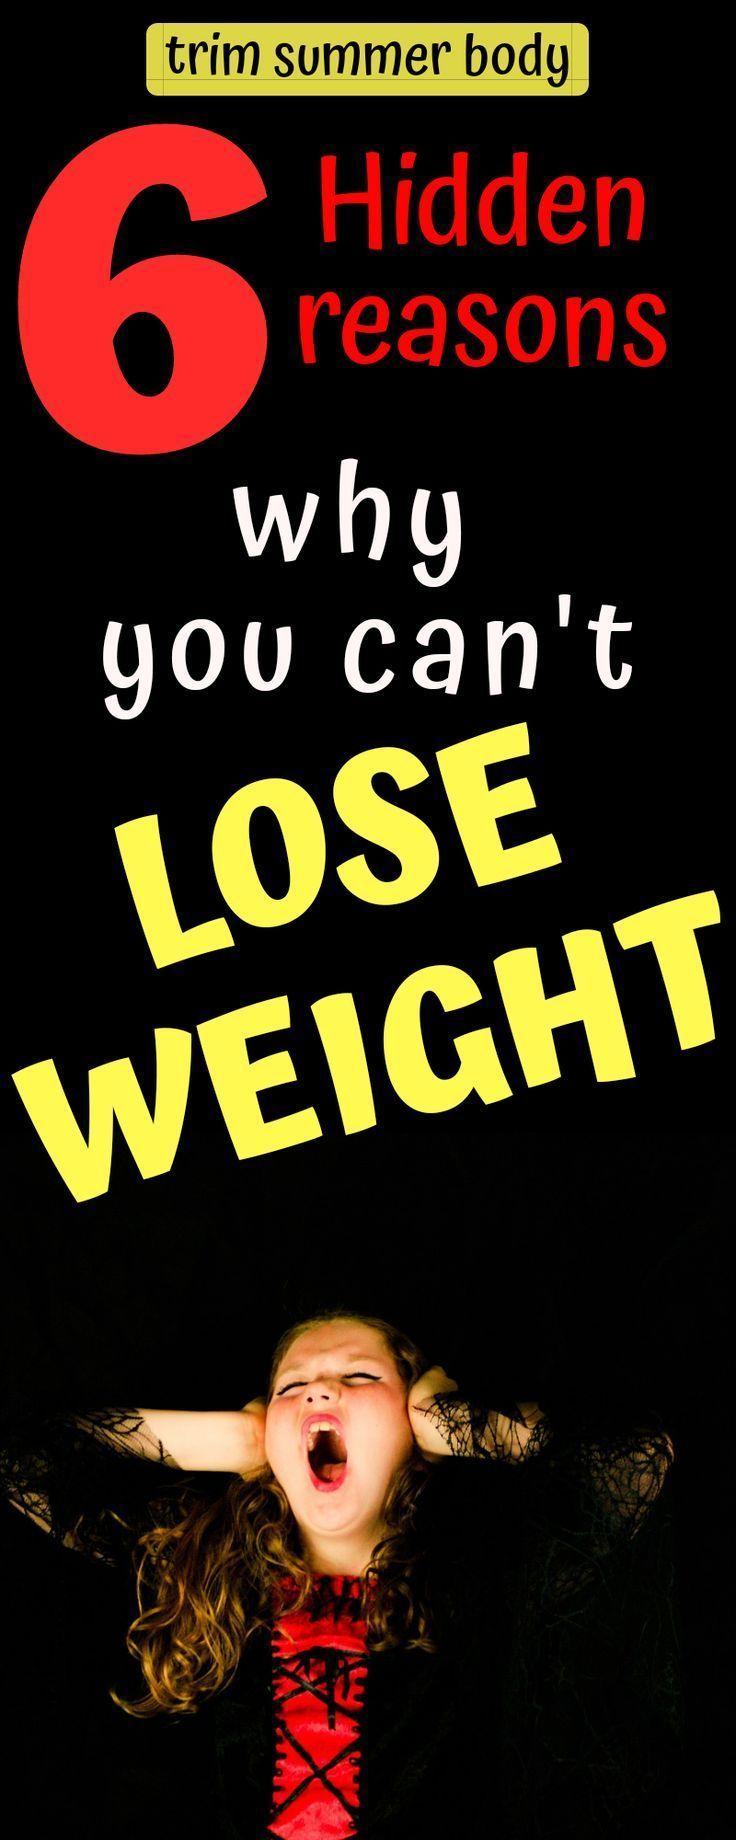 Quick weight loss center diet tips #weightlossprograms <= | fast weight loss tricks in a week#weight...